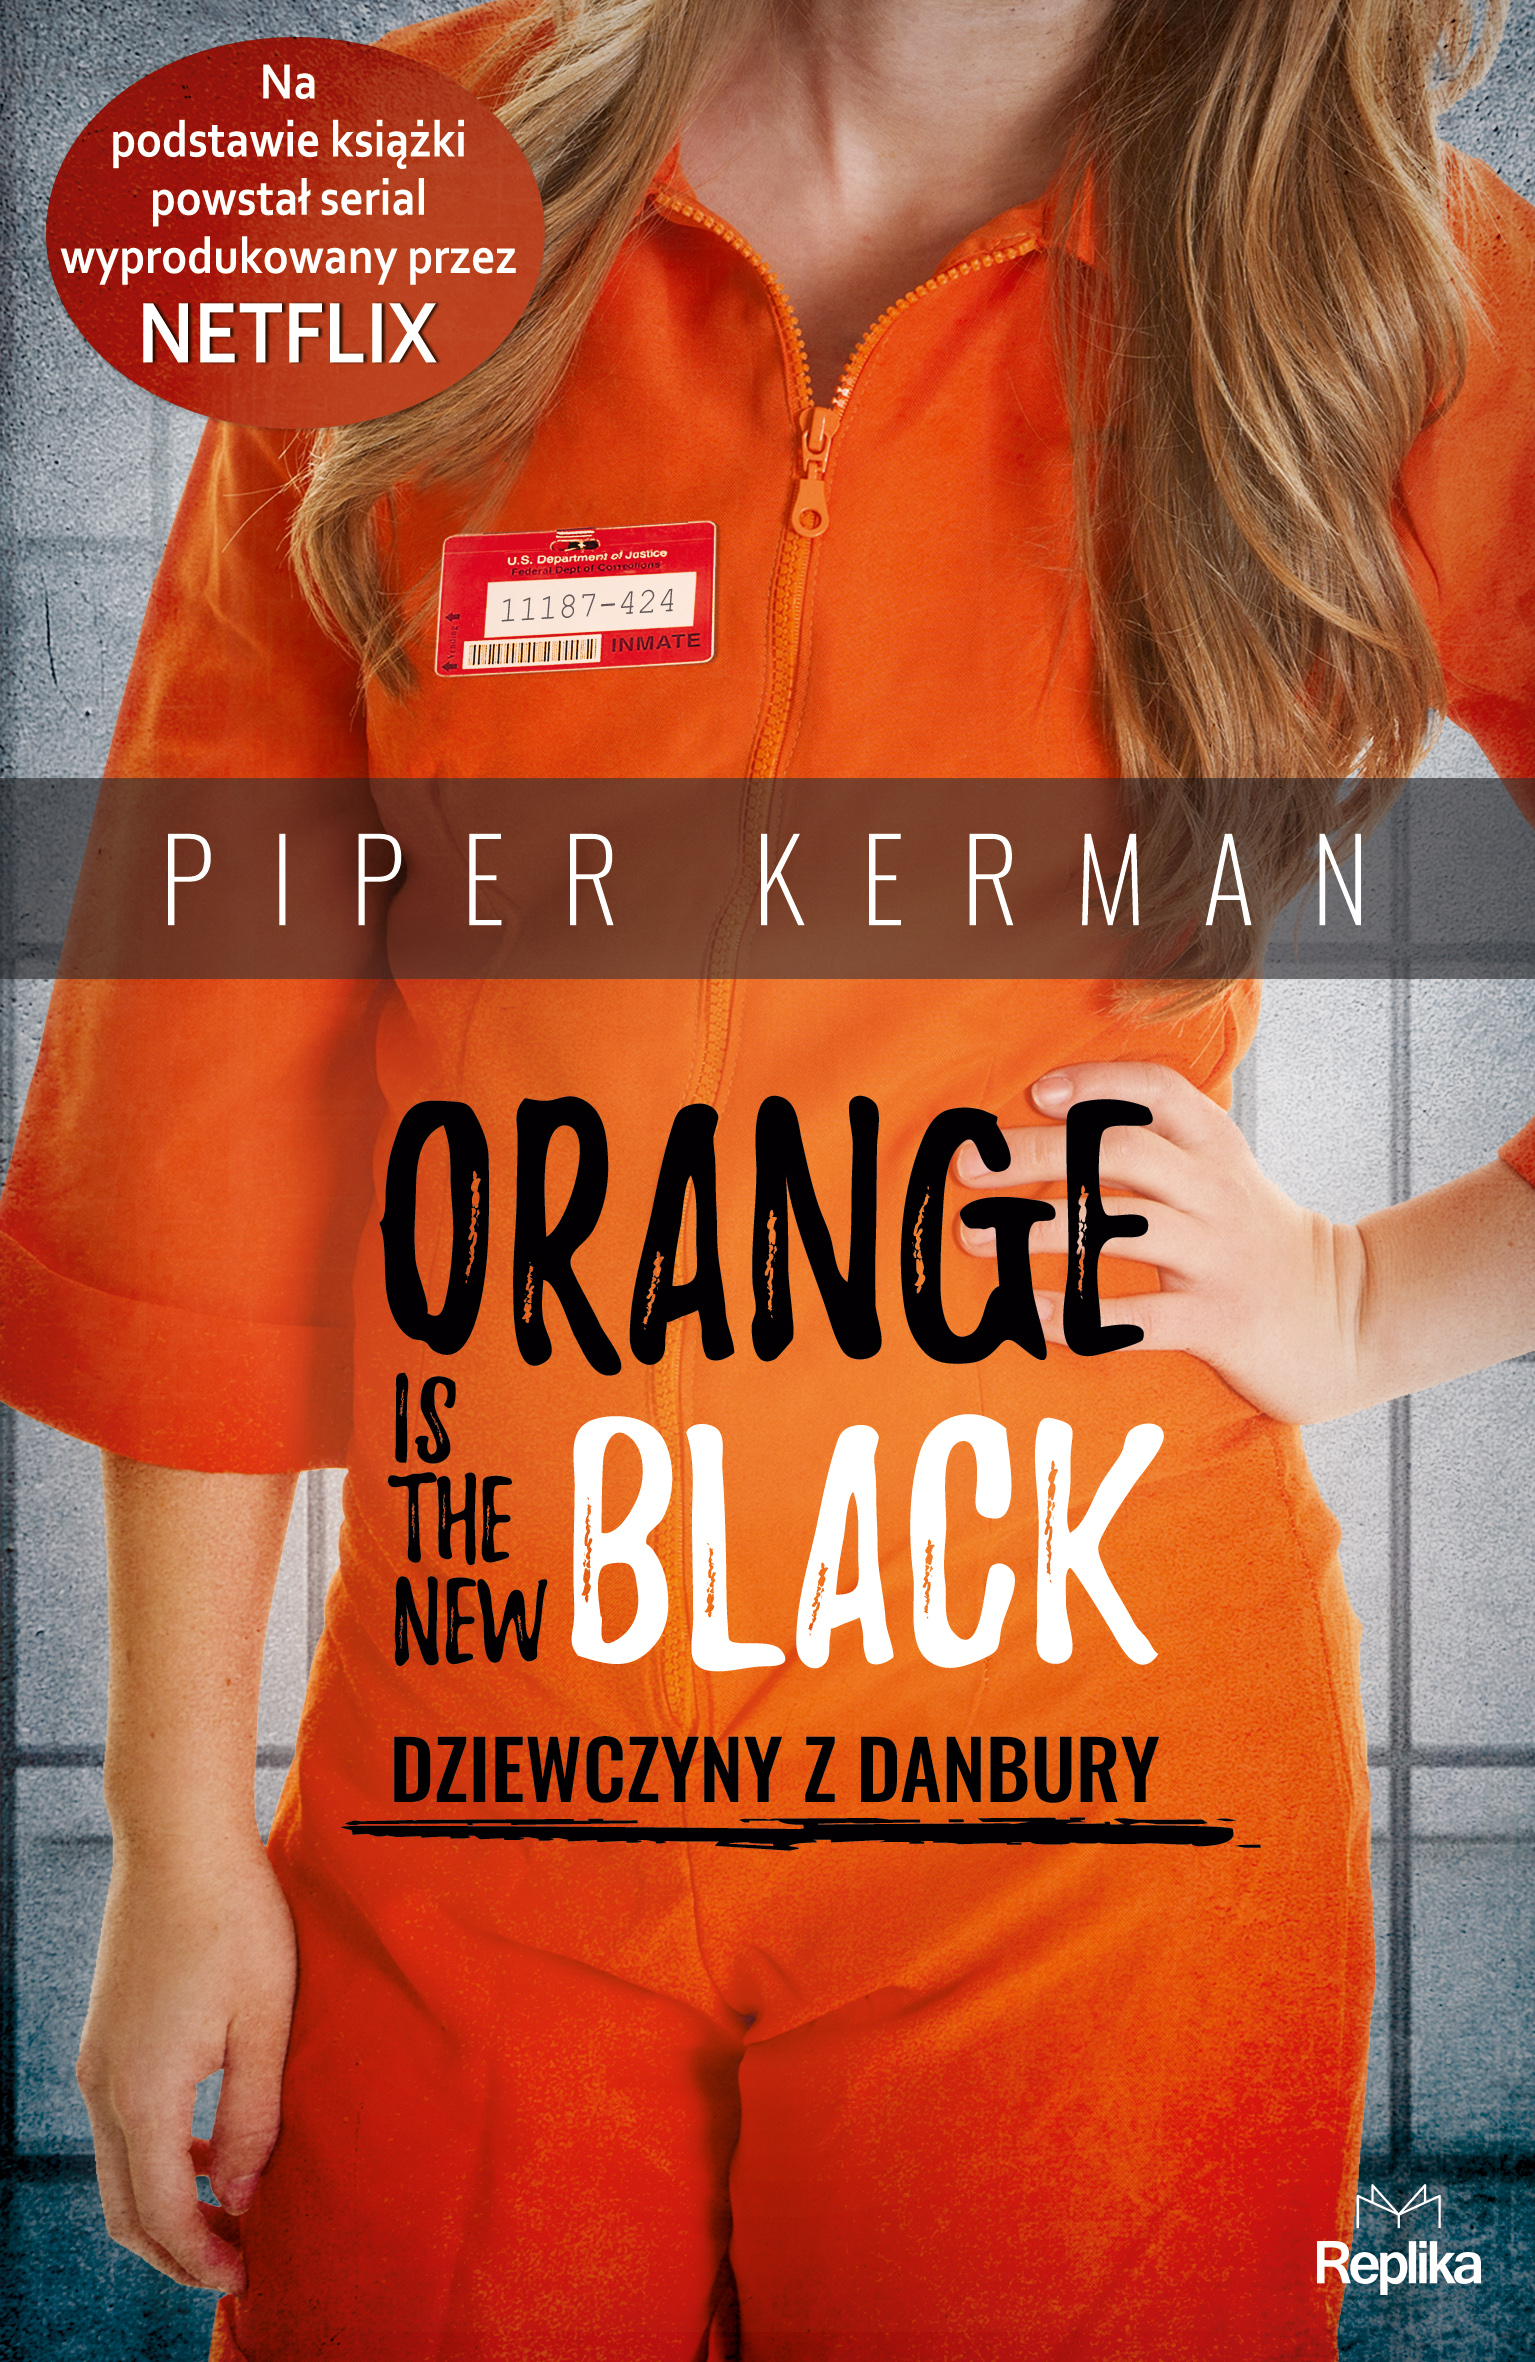 Orange is the new black_300dpi